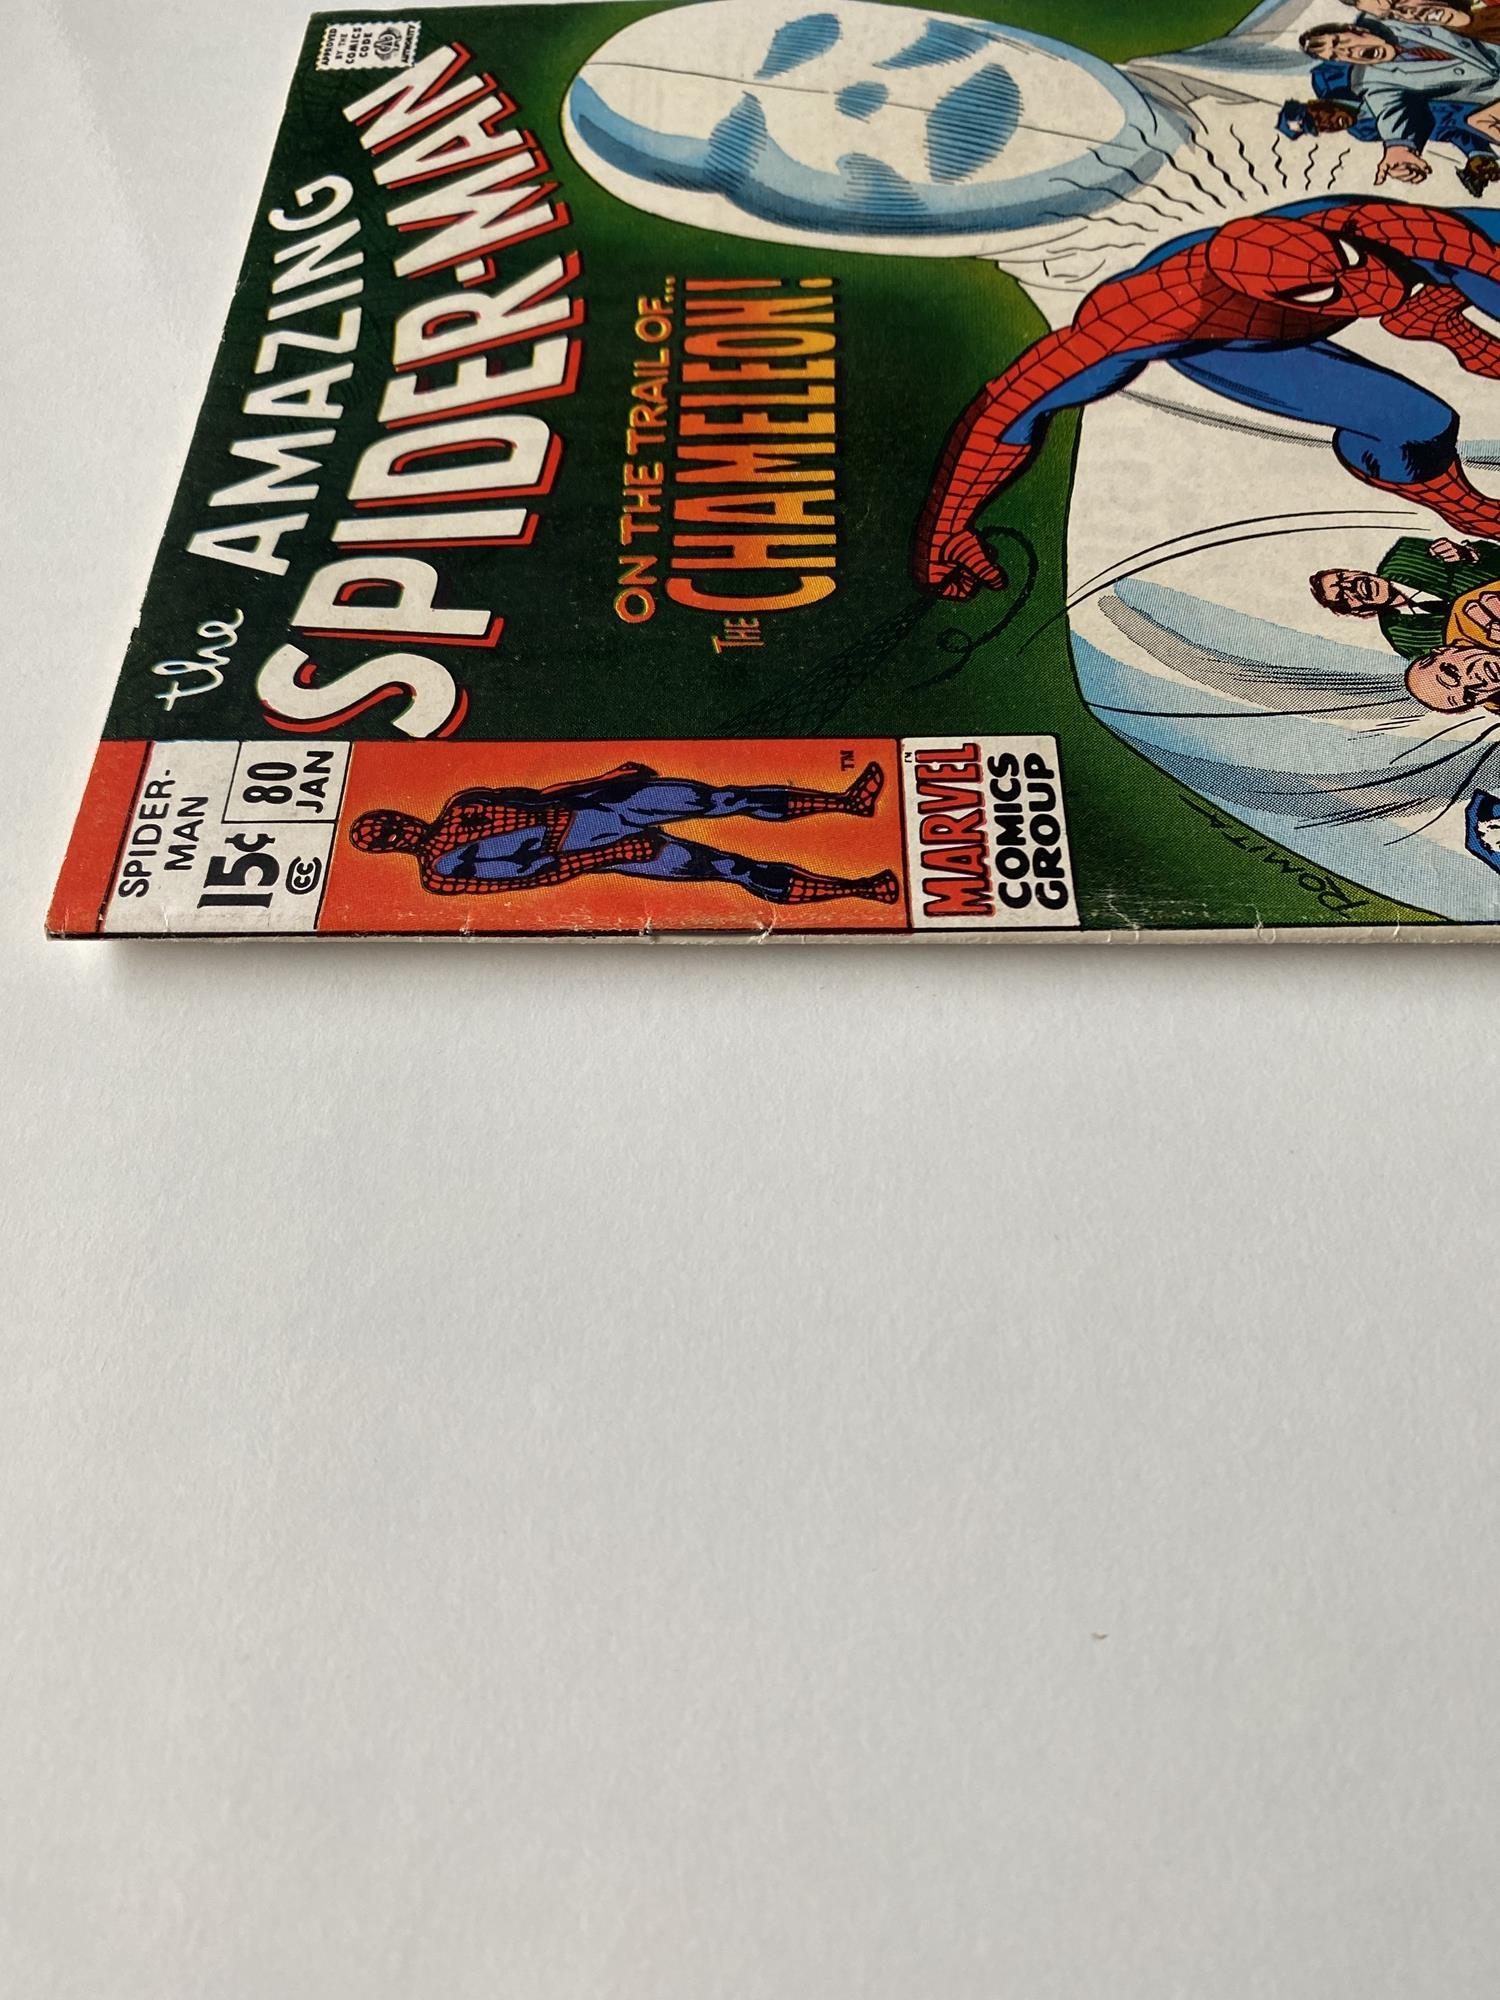 Lot 26 - AMAZING SPIDER-MAN # 80 (1970 - MARVEL - Cents Copy) - Chameleon appearance - John Romita Sr.